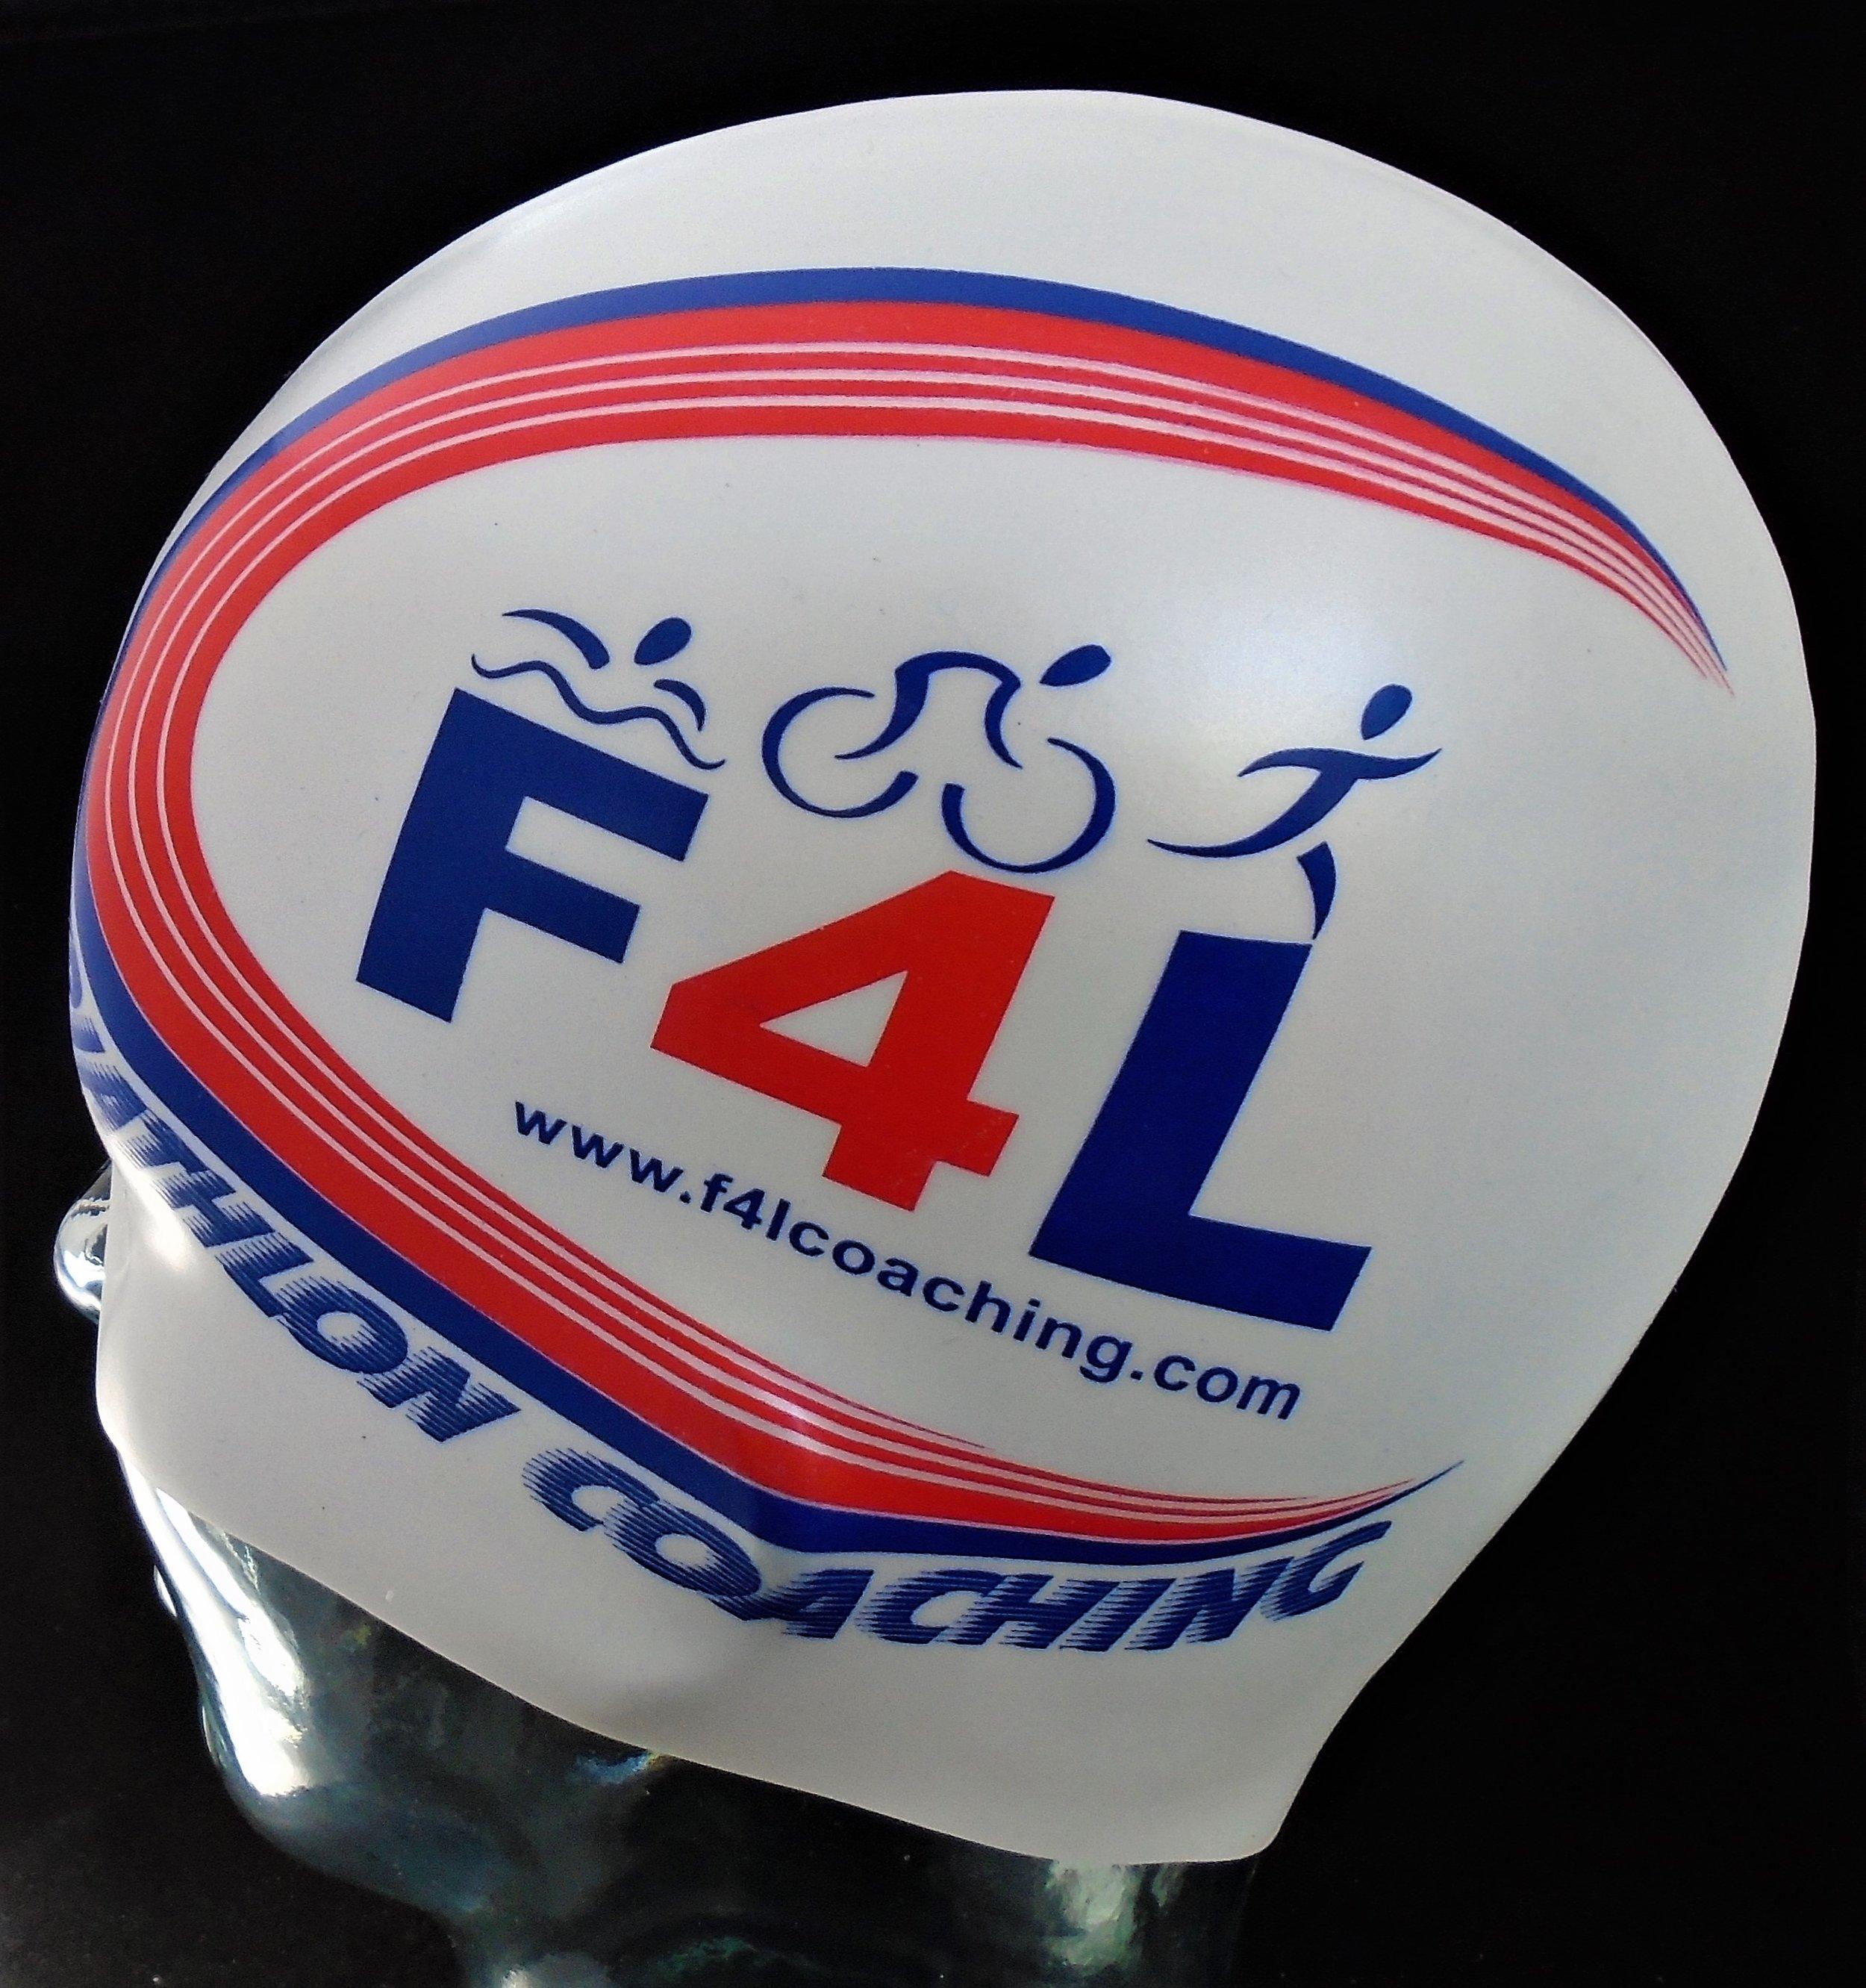 F4L Coaching side 1.jpg